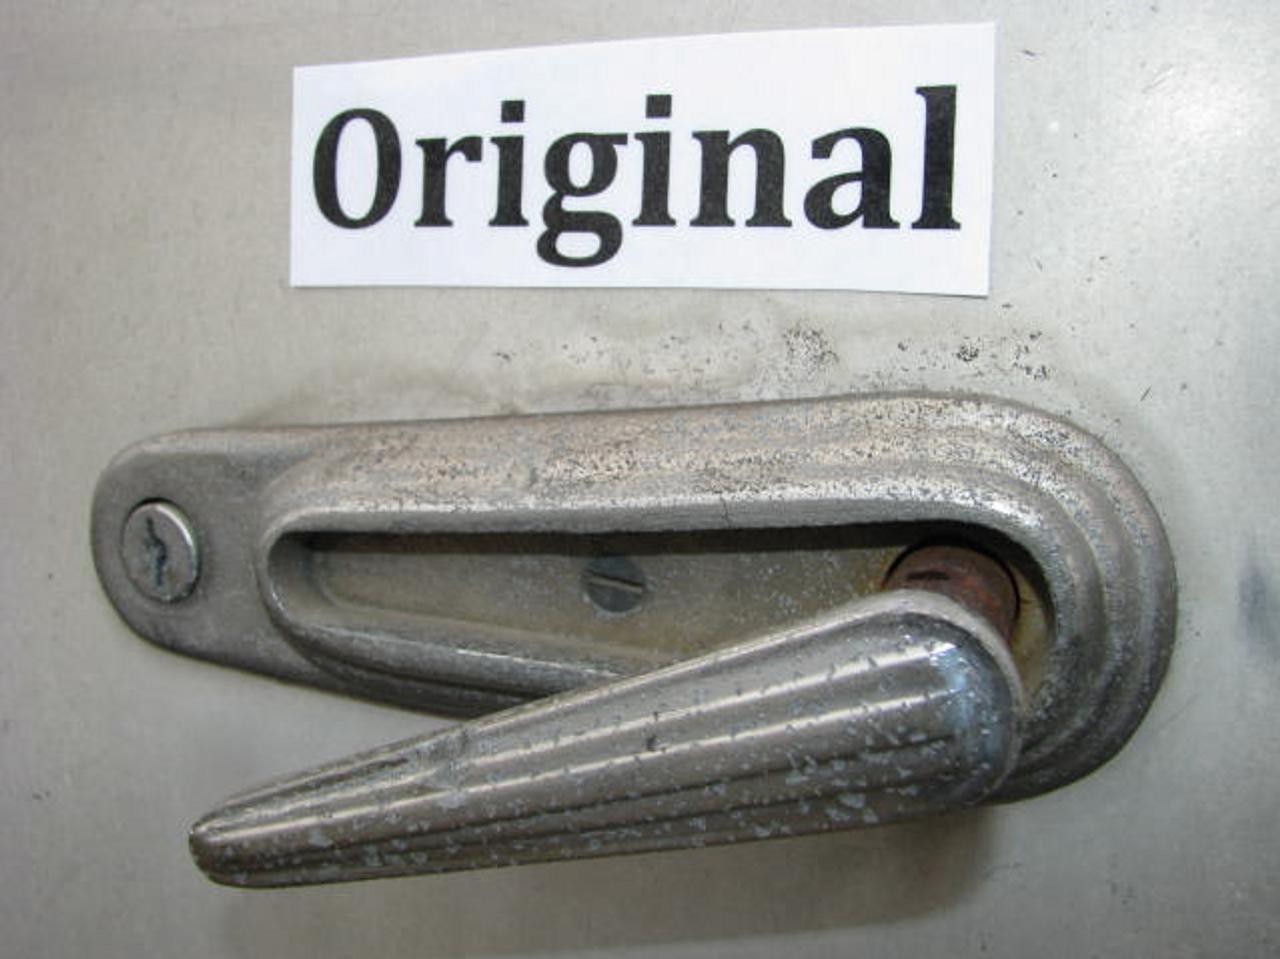 Safety Lock Retrofit Kit (46-48 Spartans) (CHW133) ORIGINAL HANDLE SHOWN